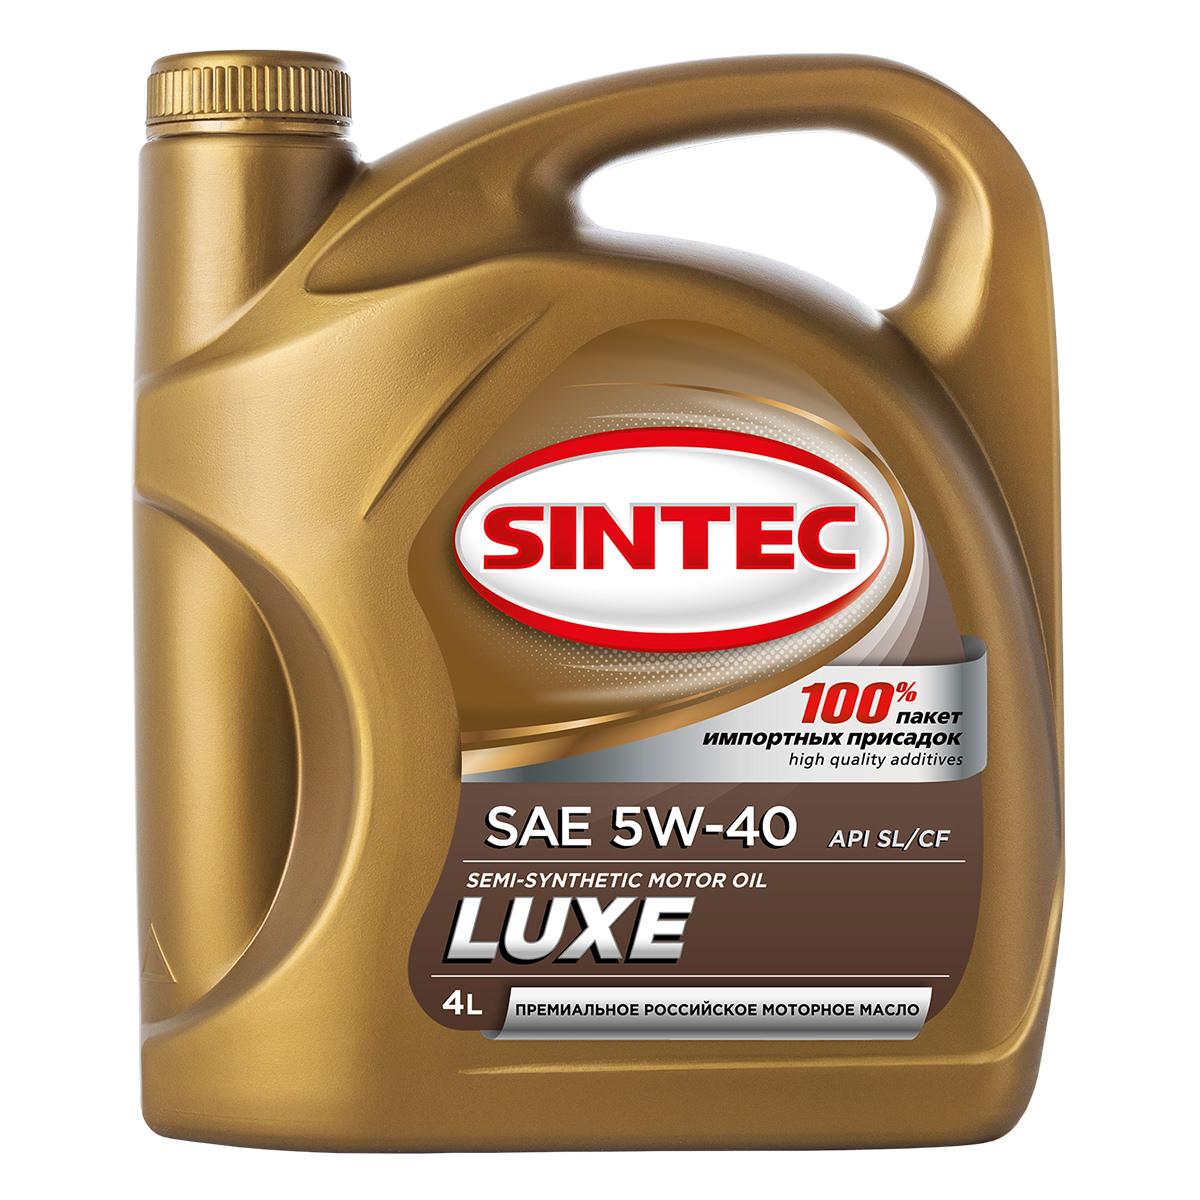 SINTEC LUXE SAE 5W-40 API SL/CF